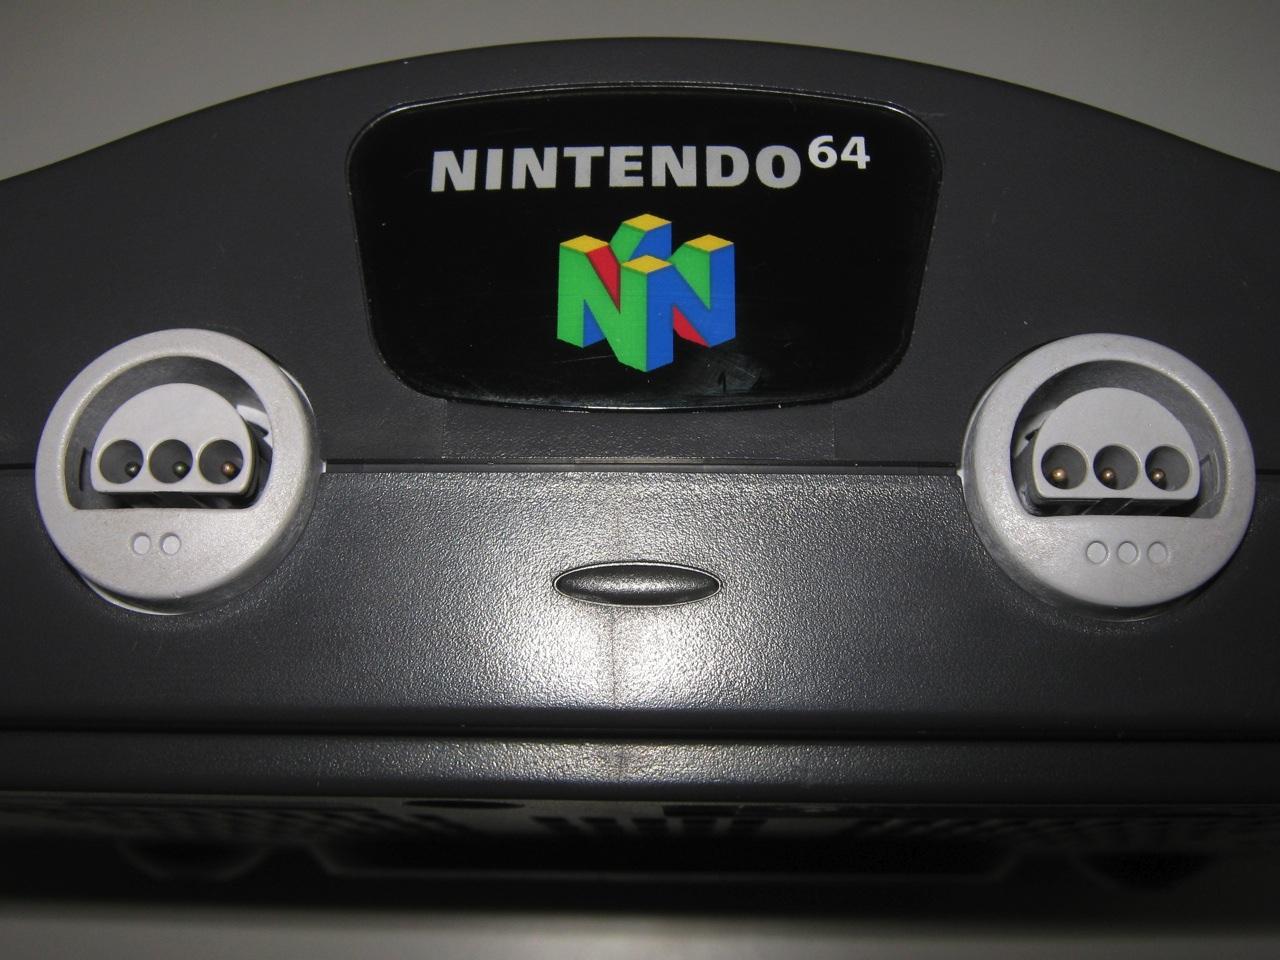 Nintendo 64 – N64 (PAL – EURO) | nIGHTFALL Blog